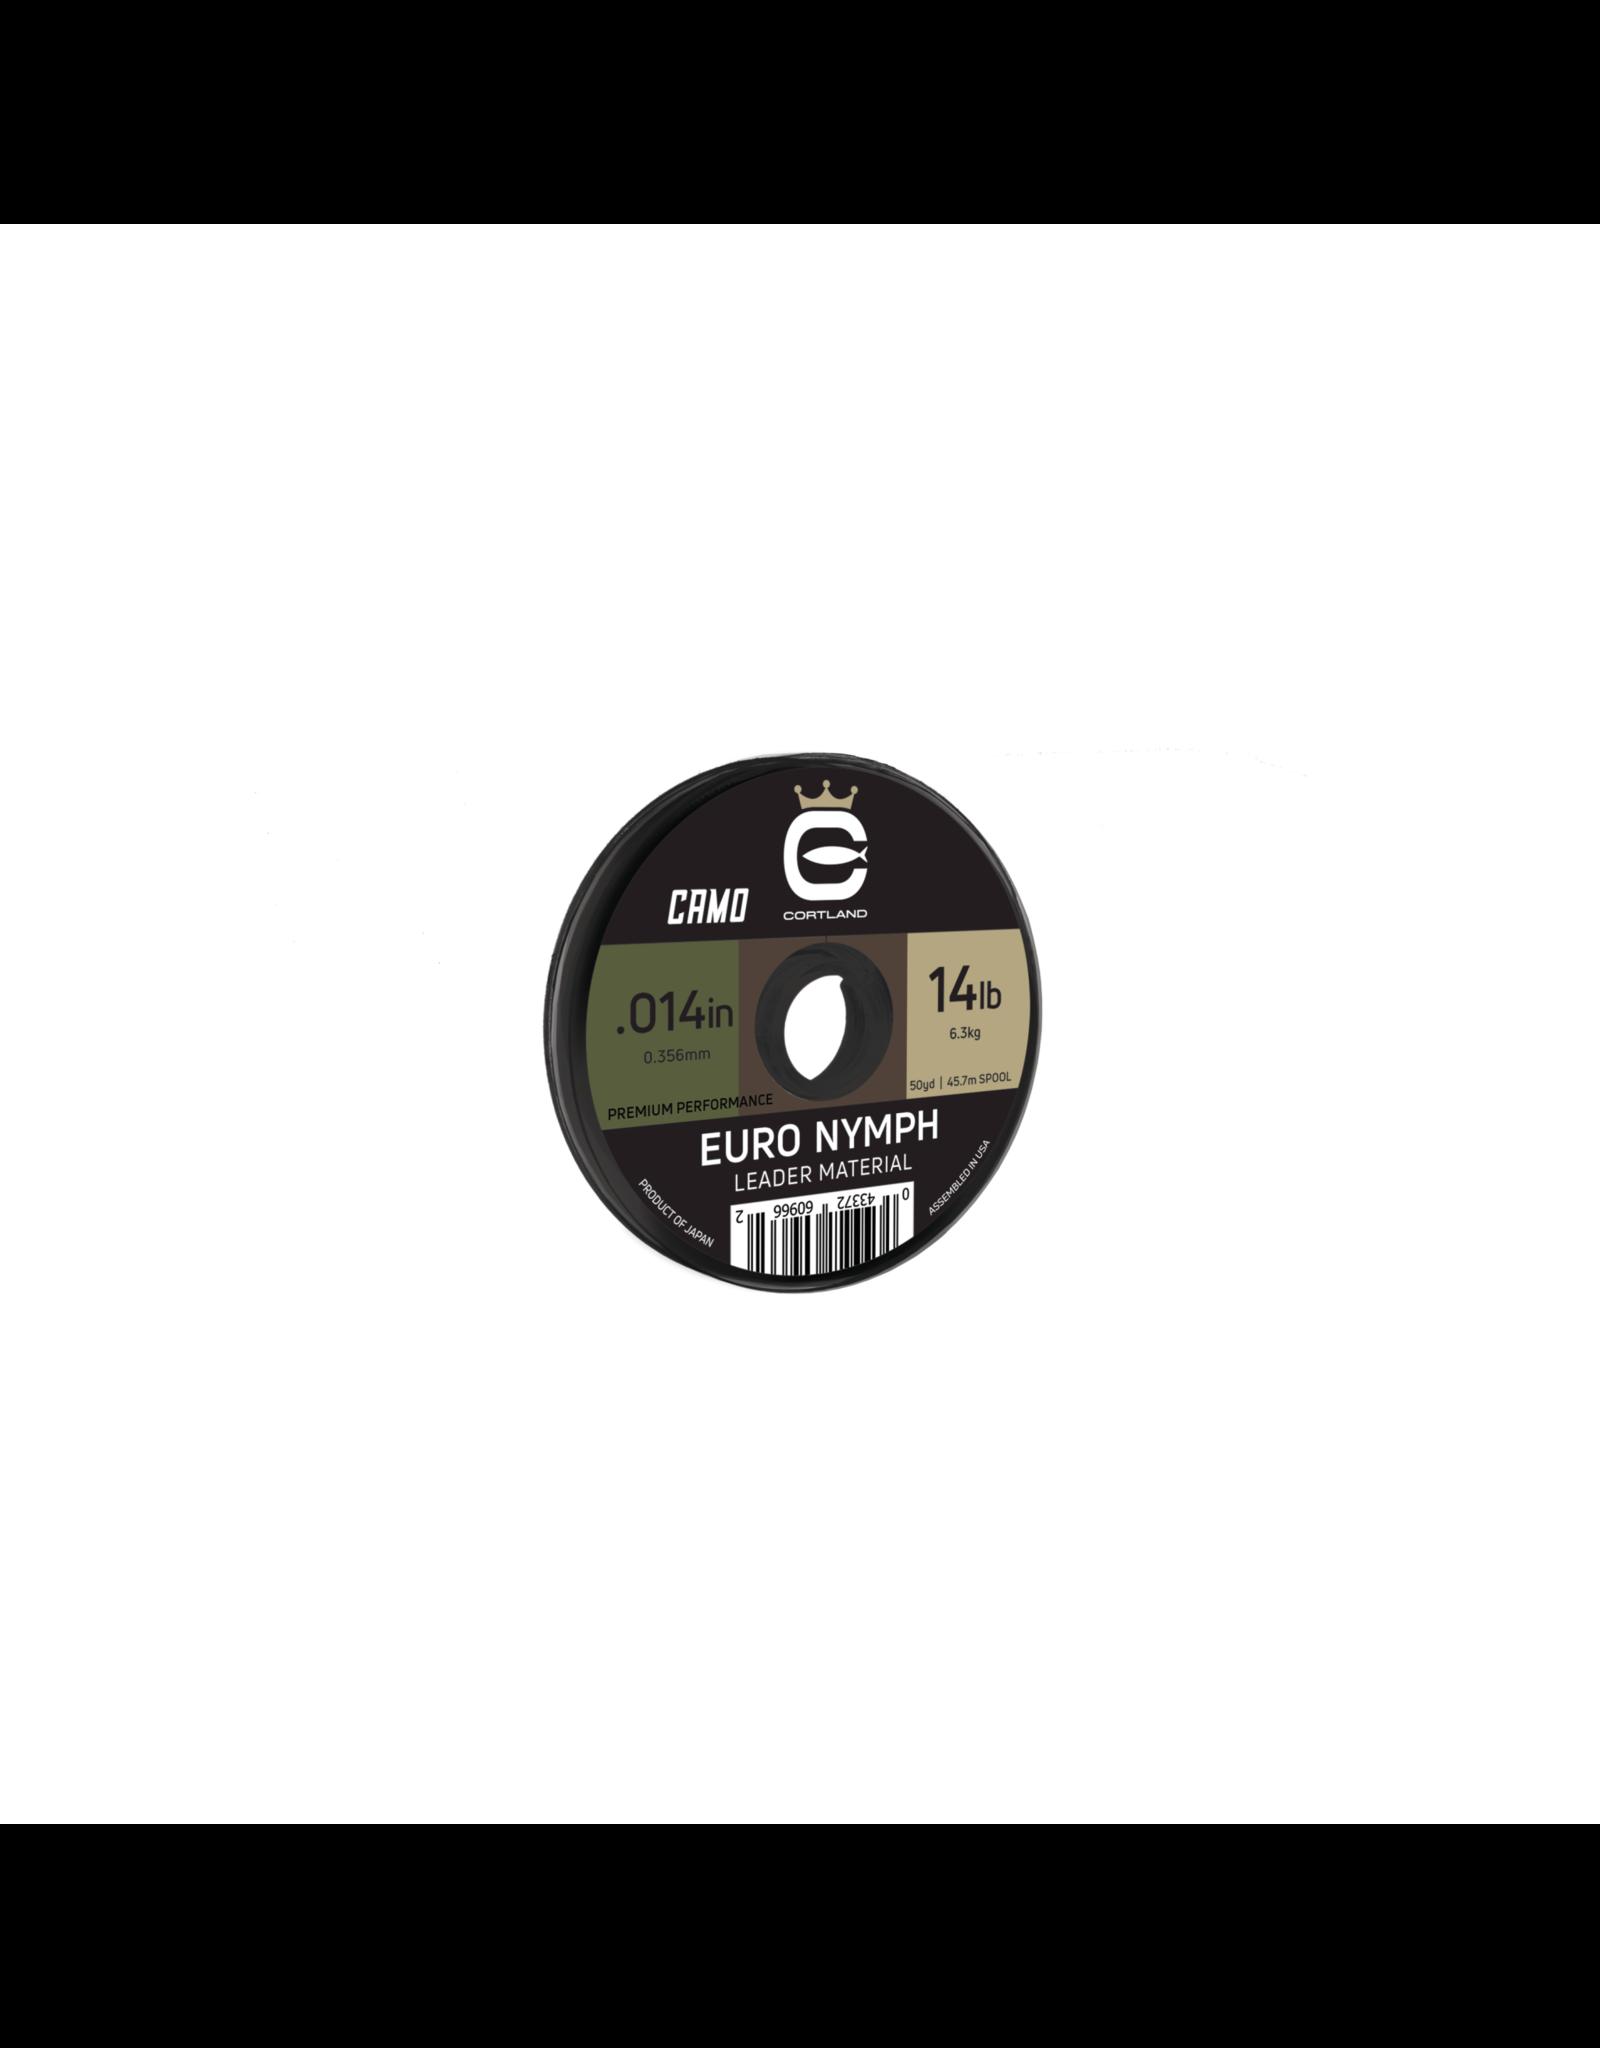 Cortland Line Cortland Euro Nymph Camo Nylon Leader Material